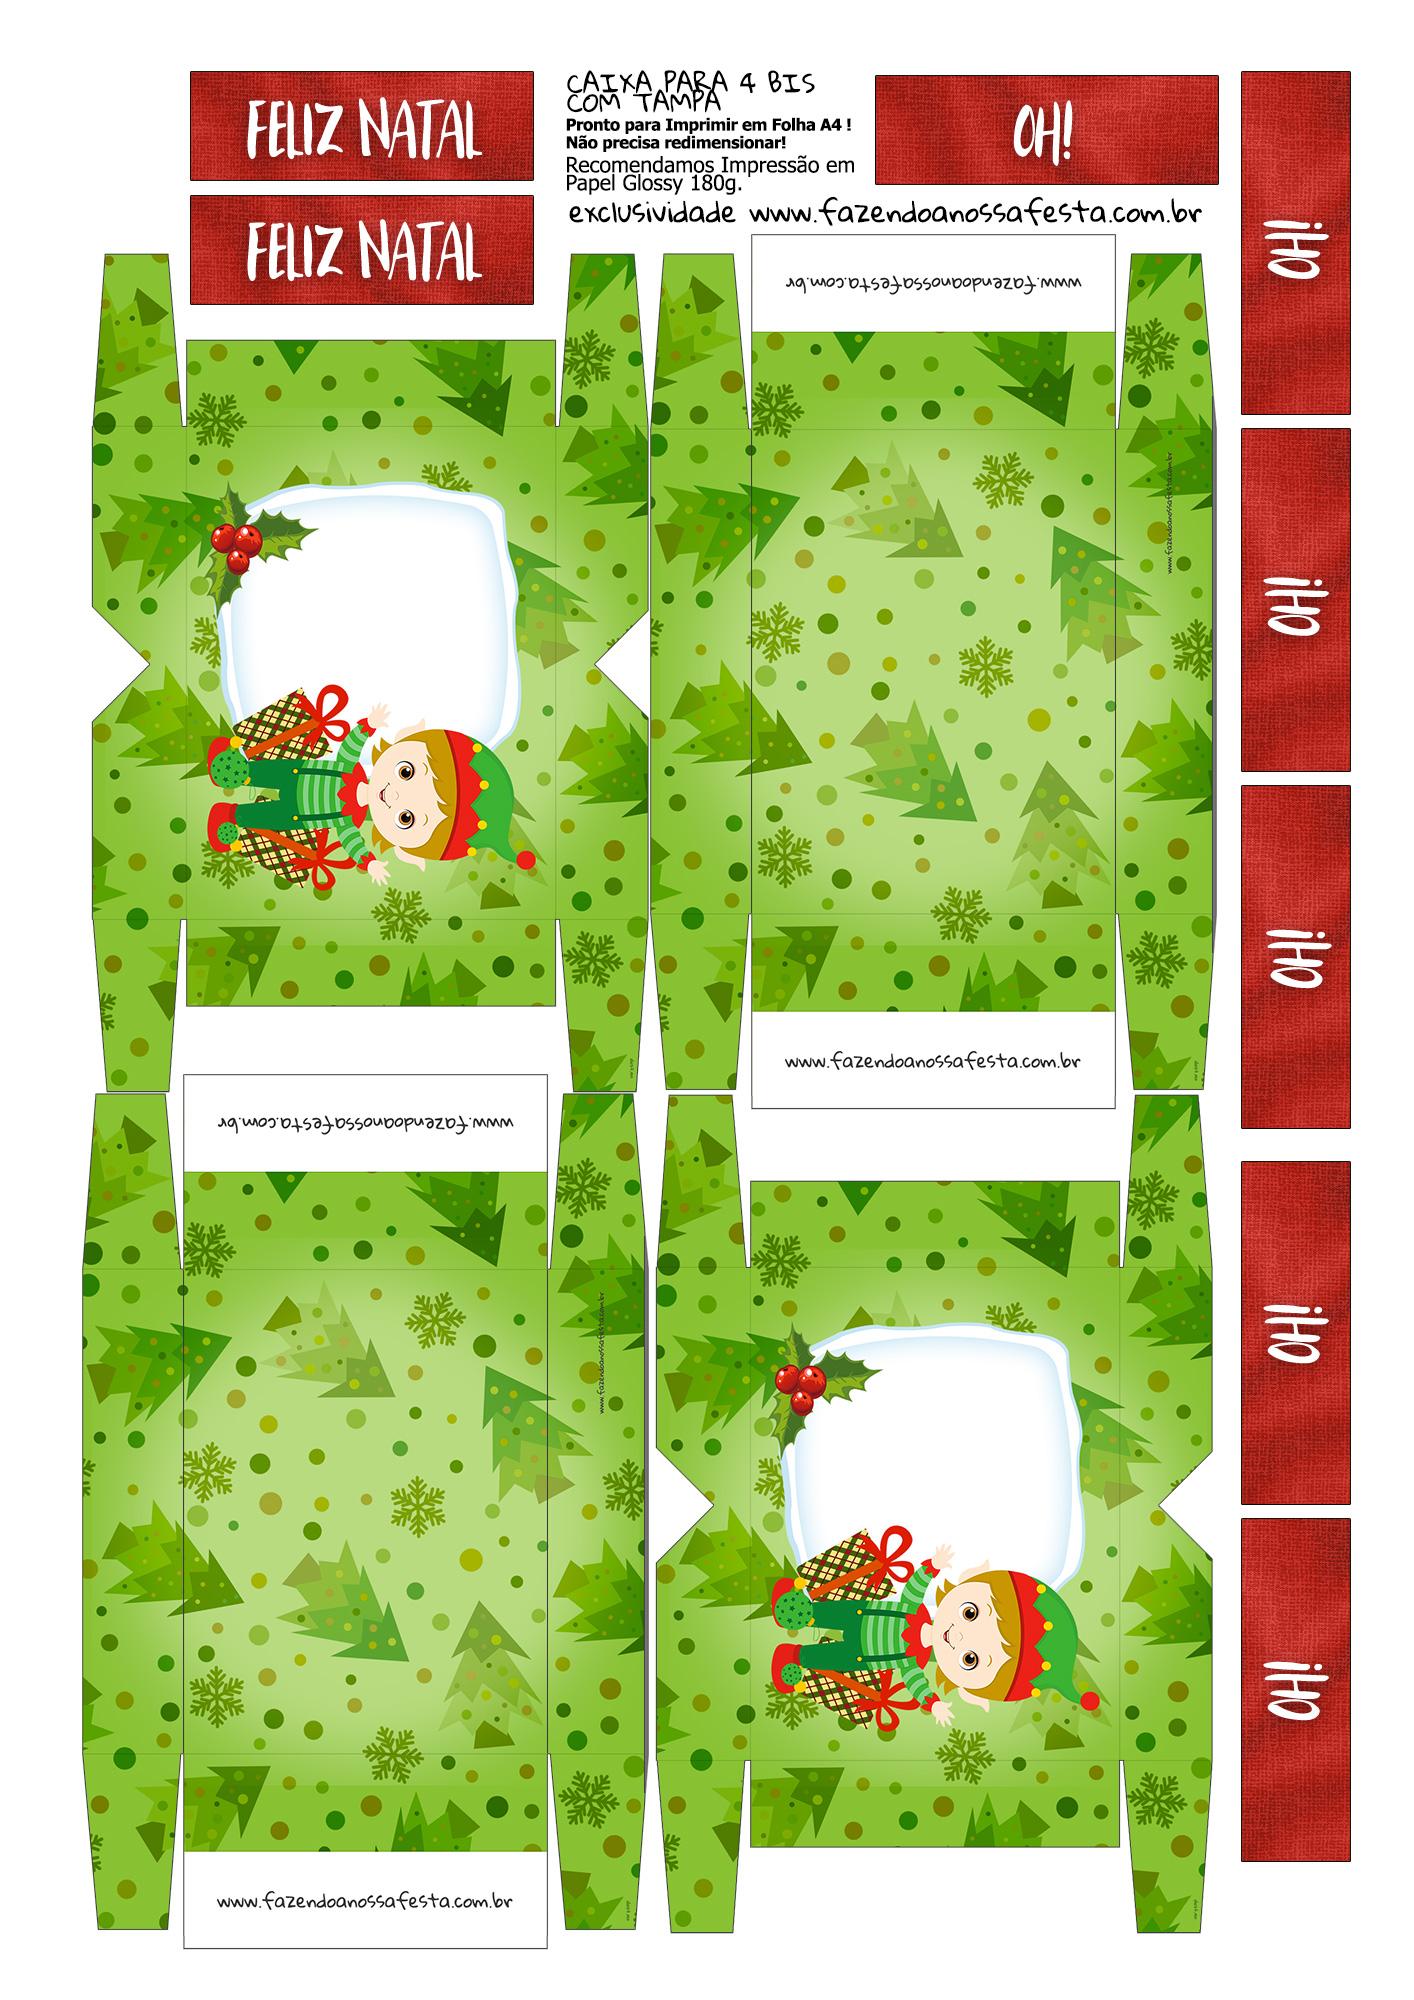 Lembrancinha para Natal Caixa 4 Bis 2